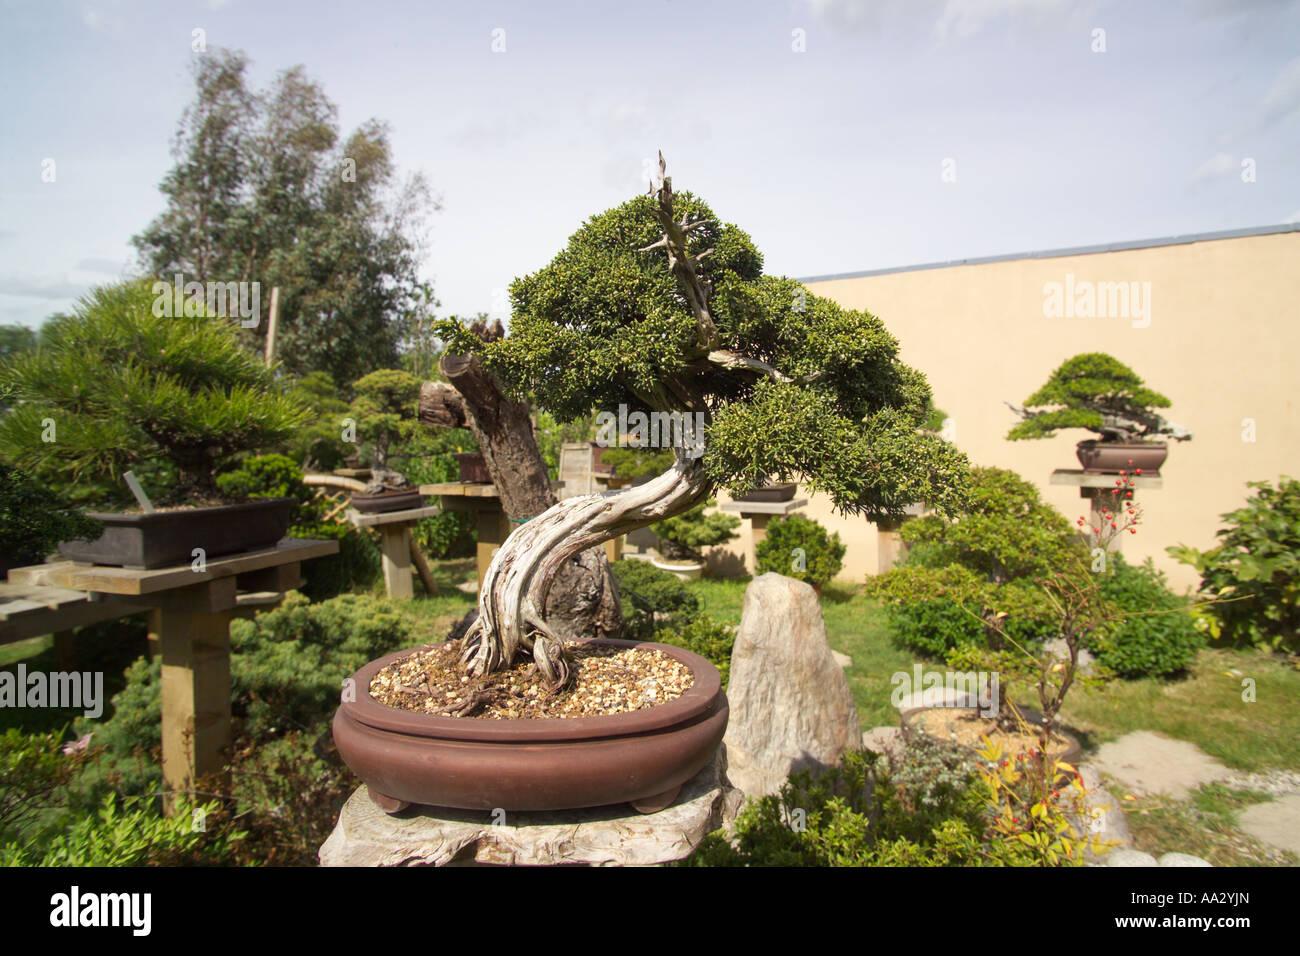 Pine bonsai trees in garden kent stock photo royalty free for Garden trees kent